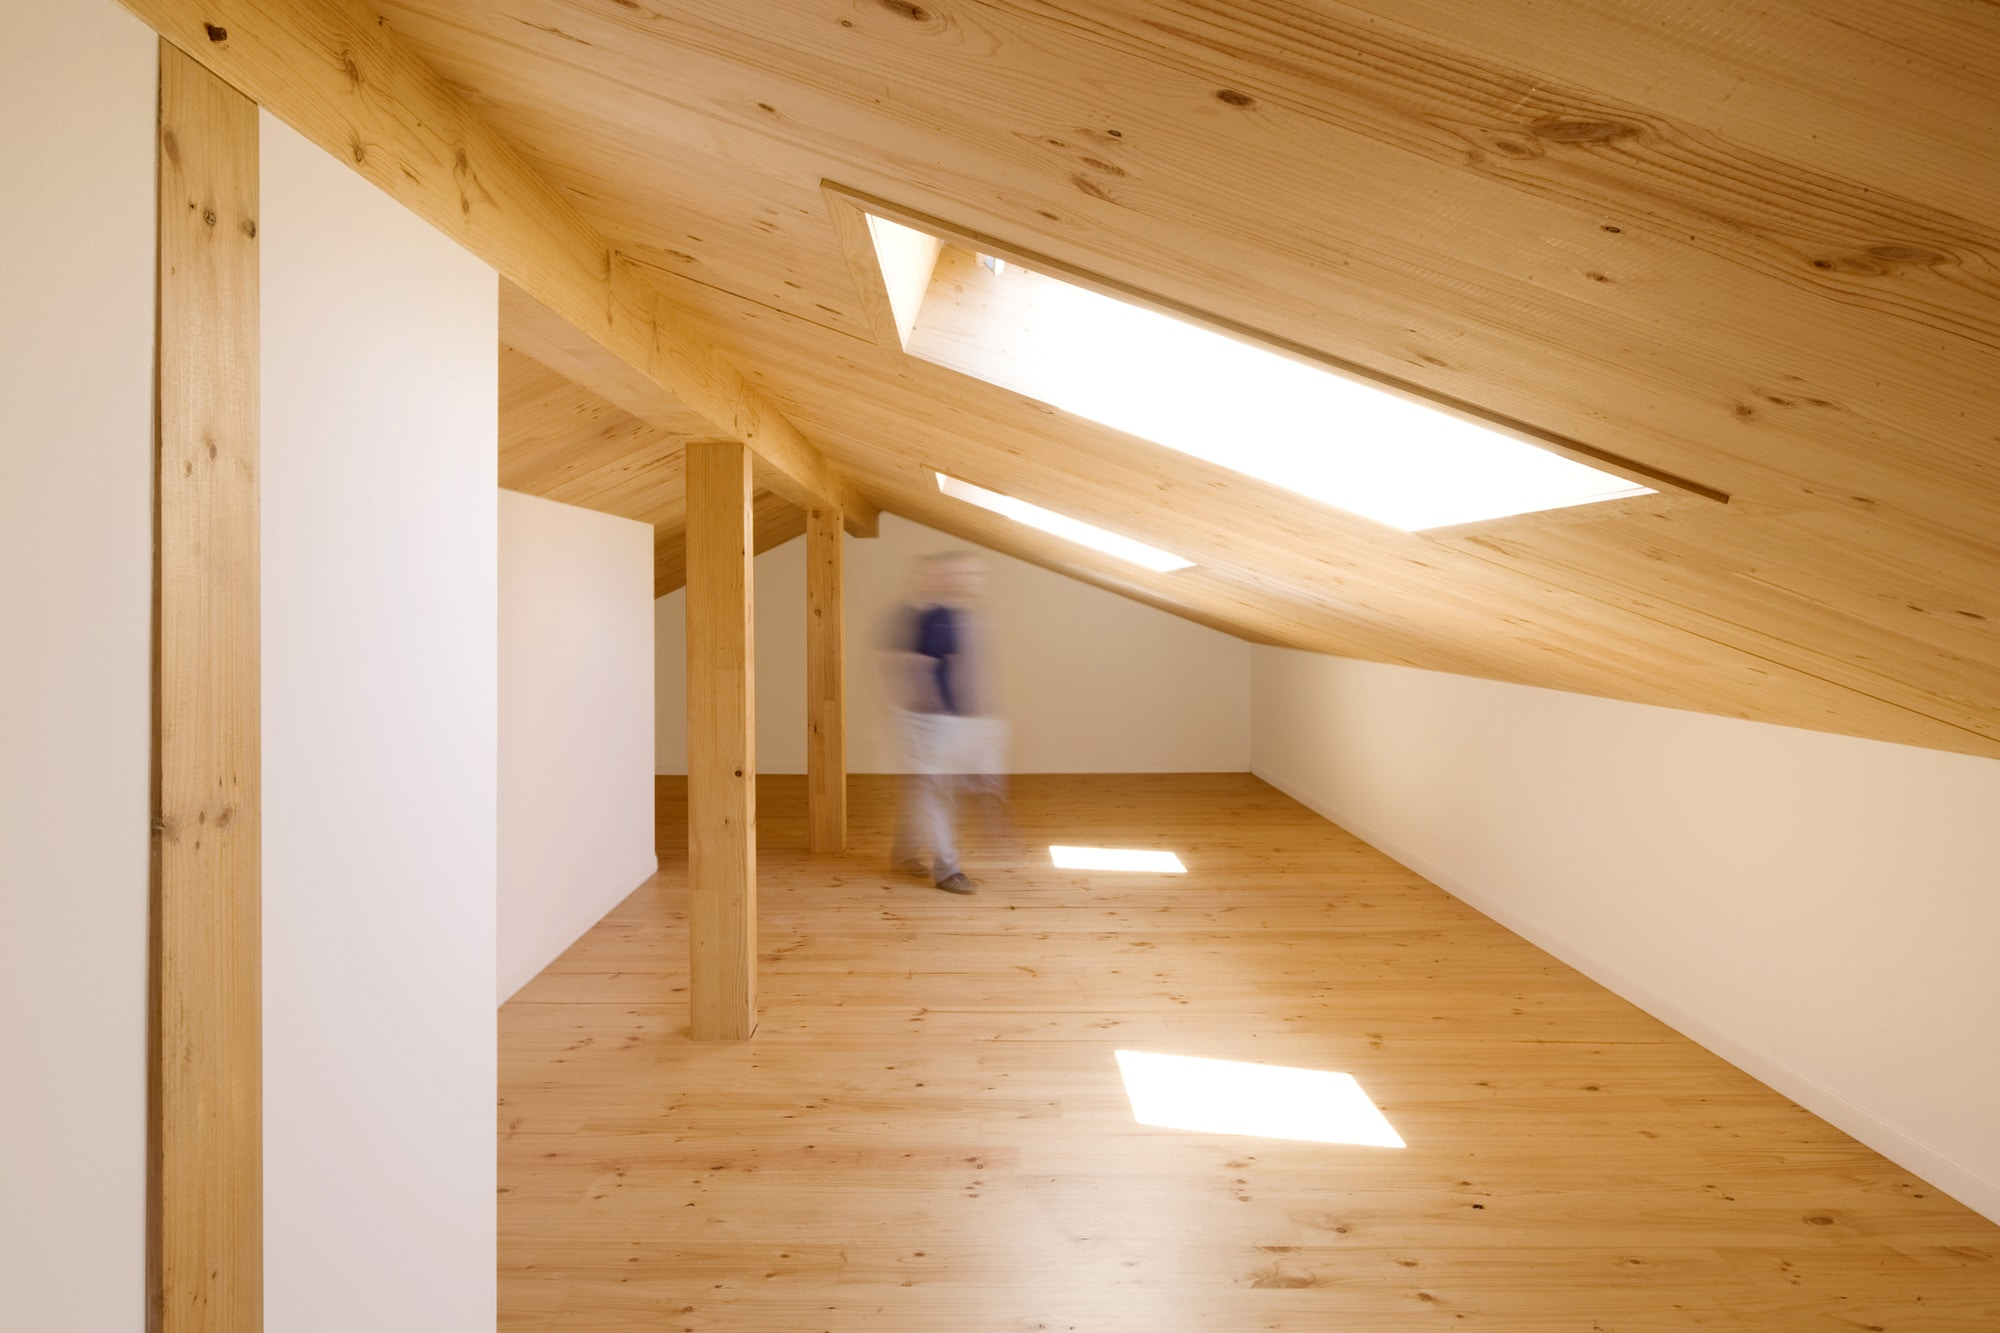 Dise o de casa r stica de piedra planos construye hogar for Fotos en madera